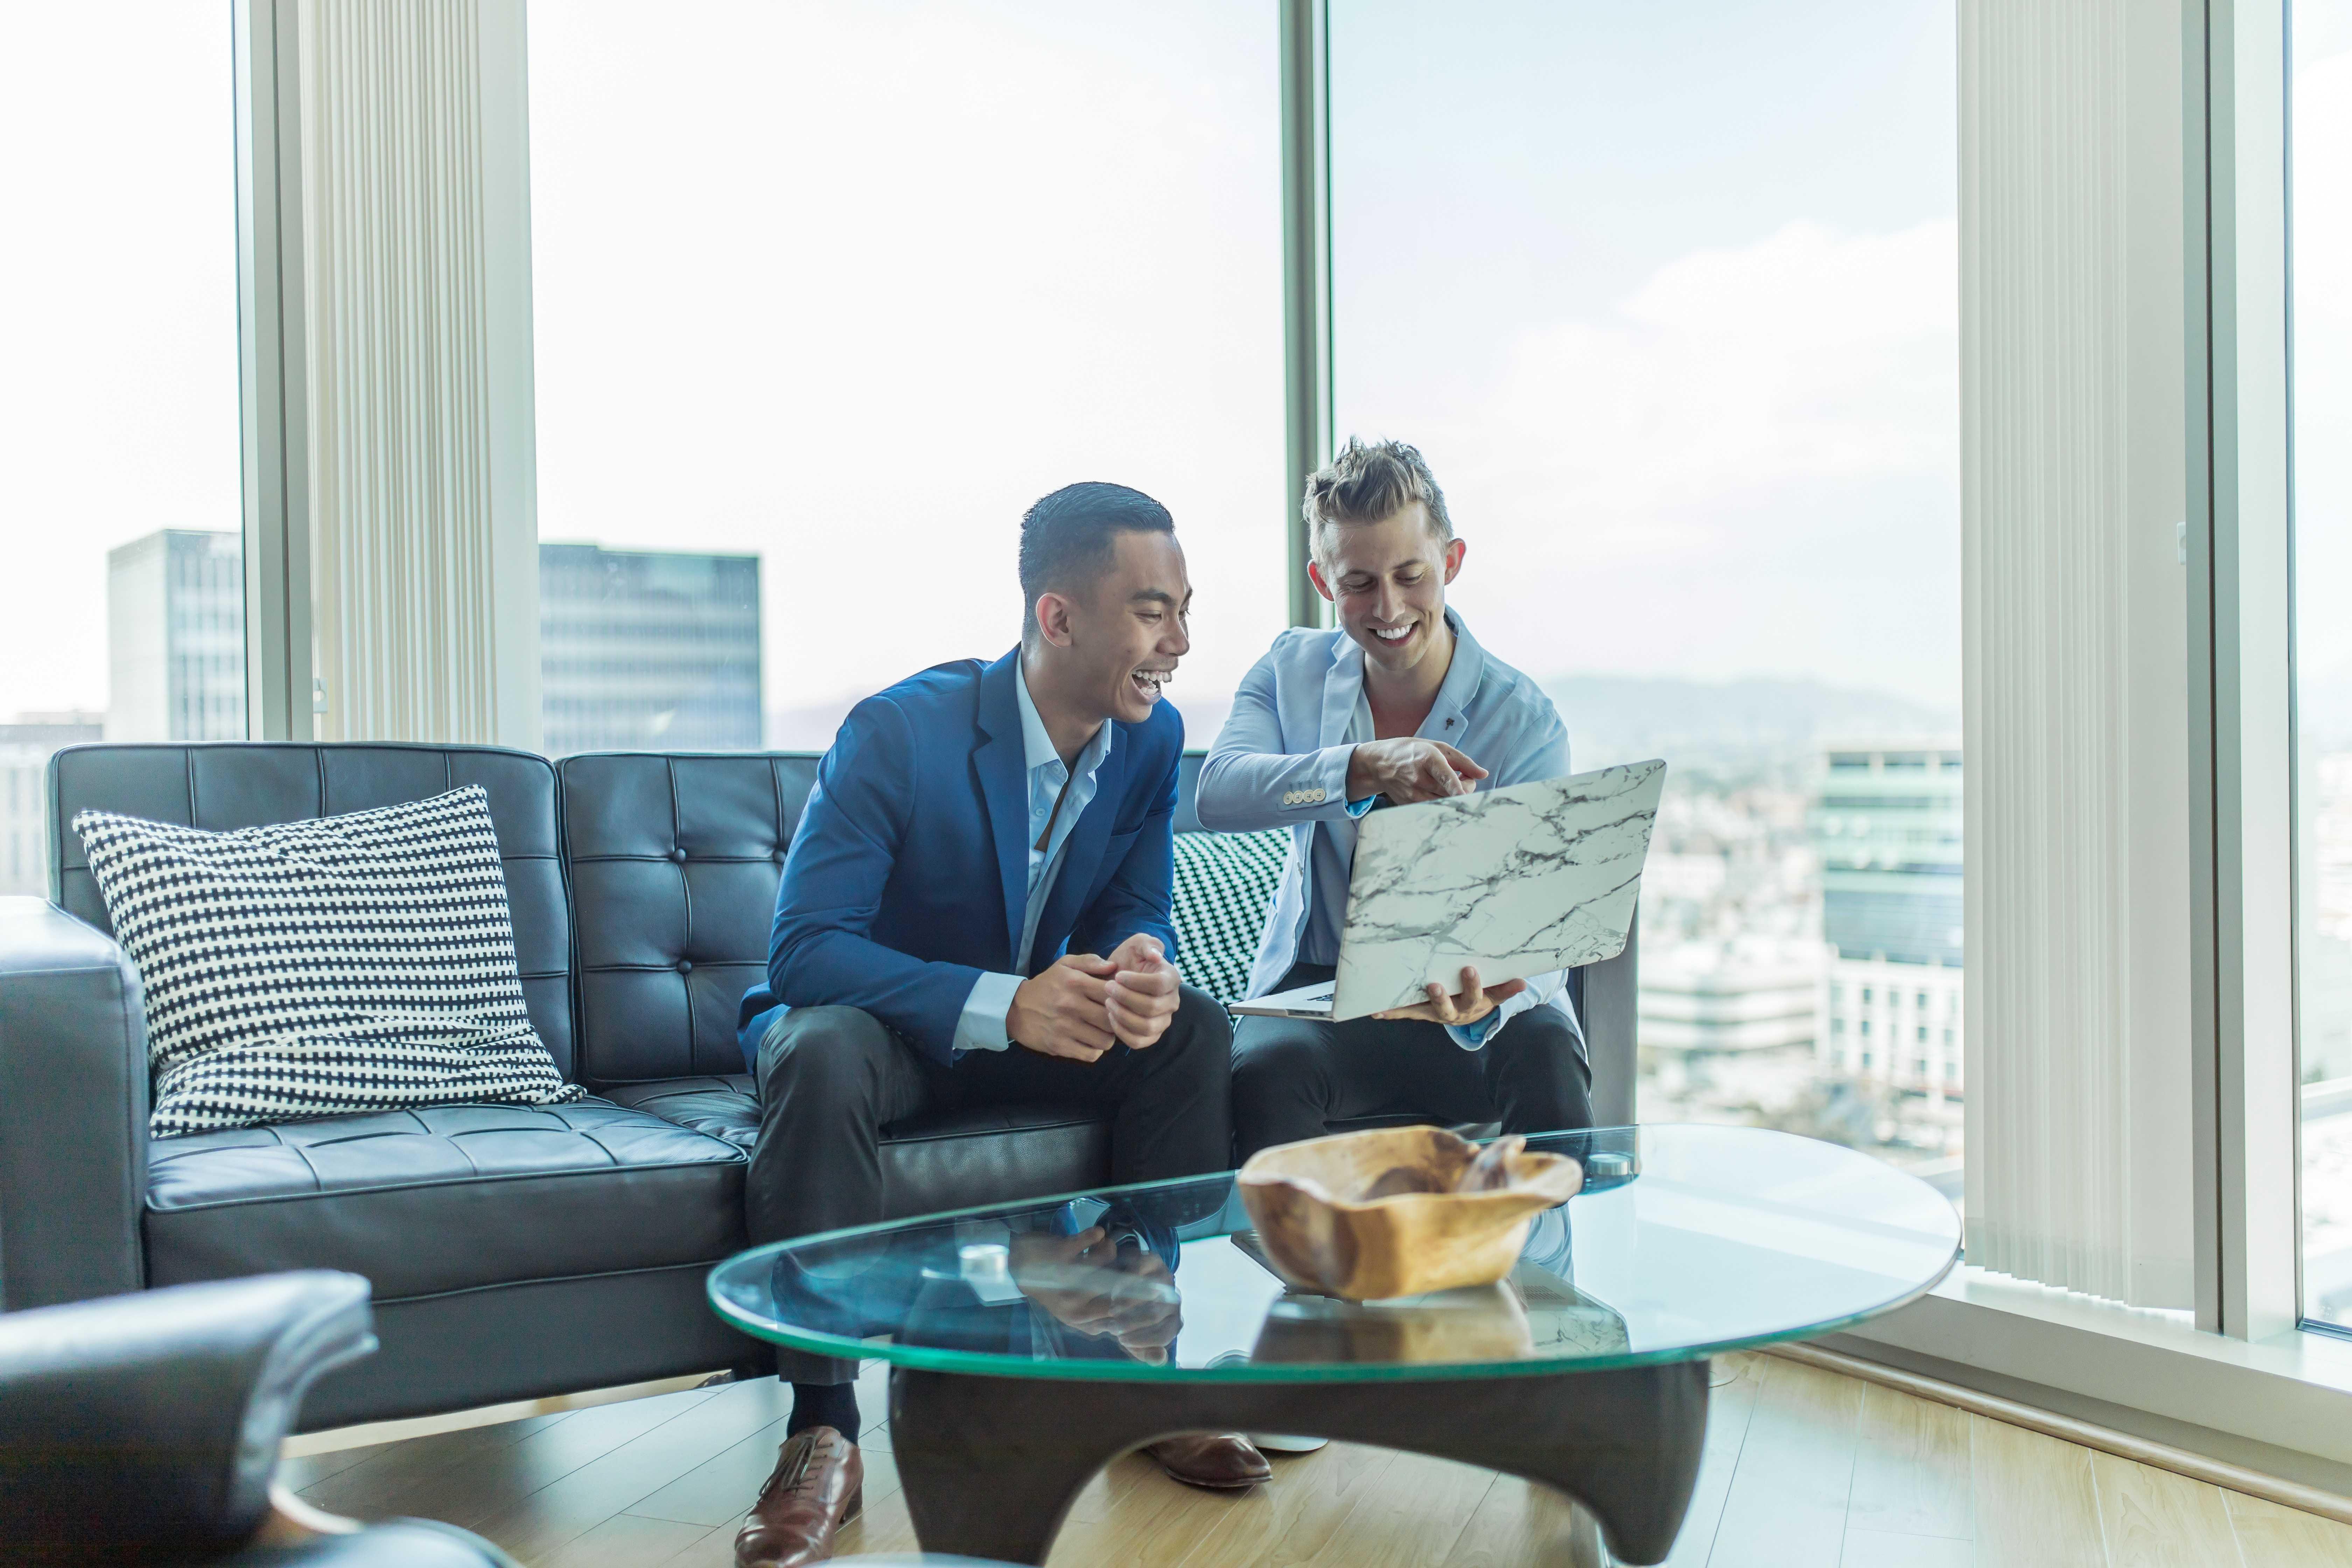 build work portfolio through upwork and linkedin